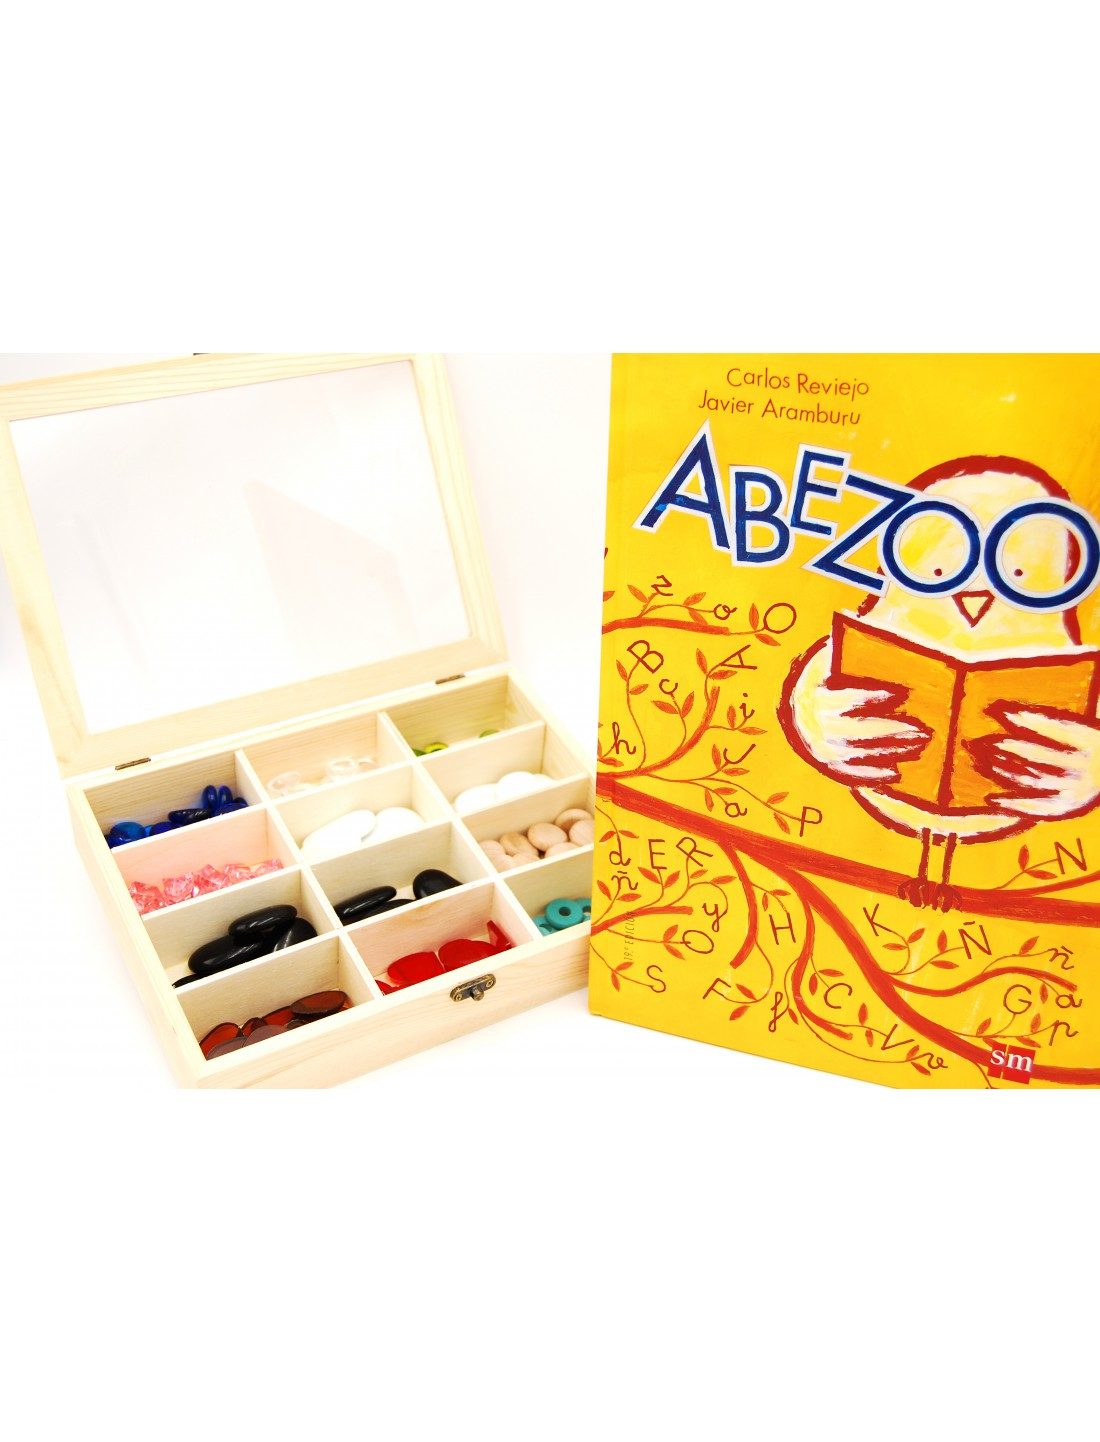 Pack Abezoo+Piezas sueltas. Arkhé